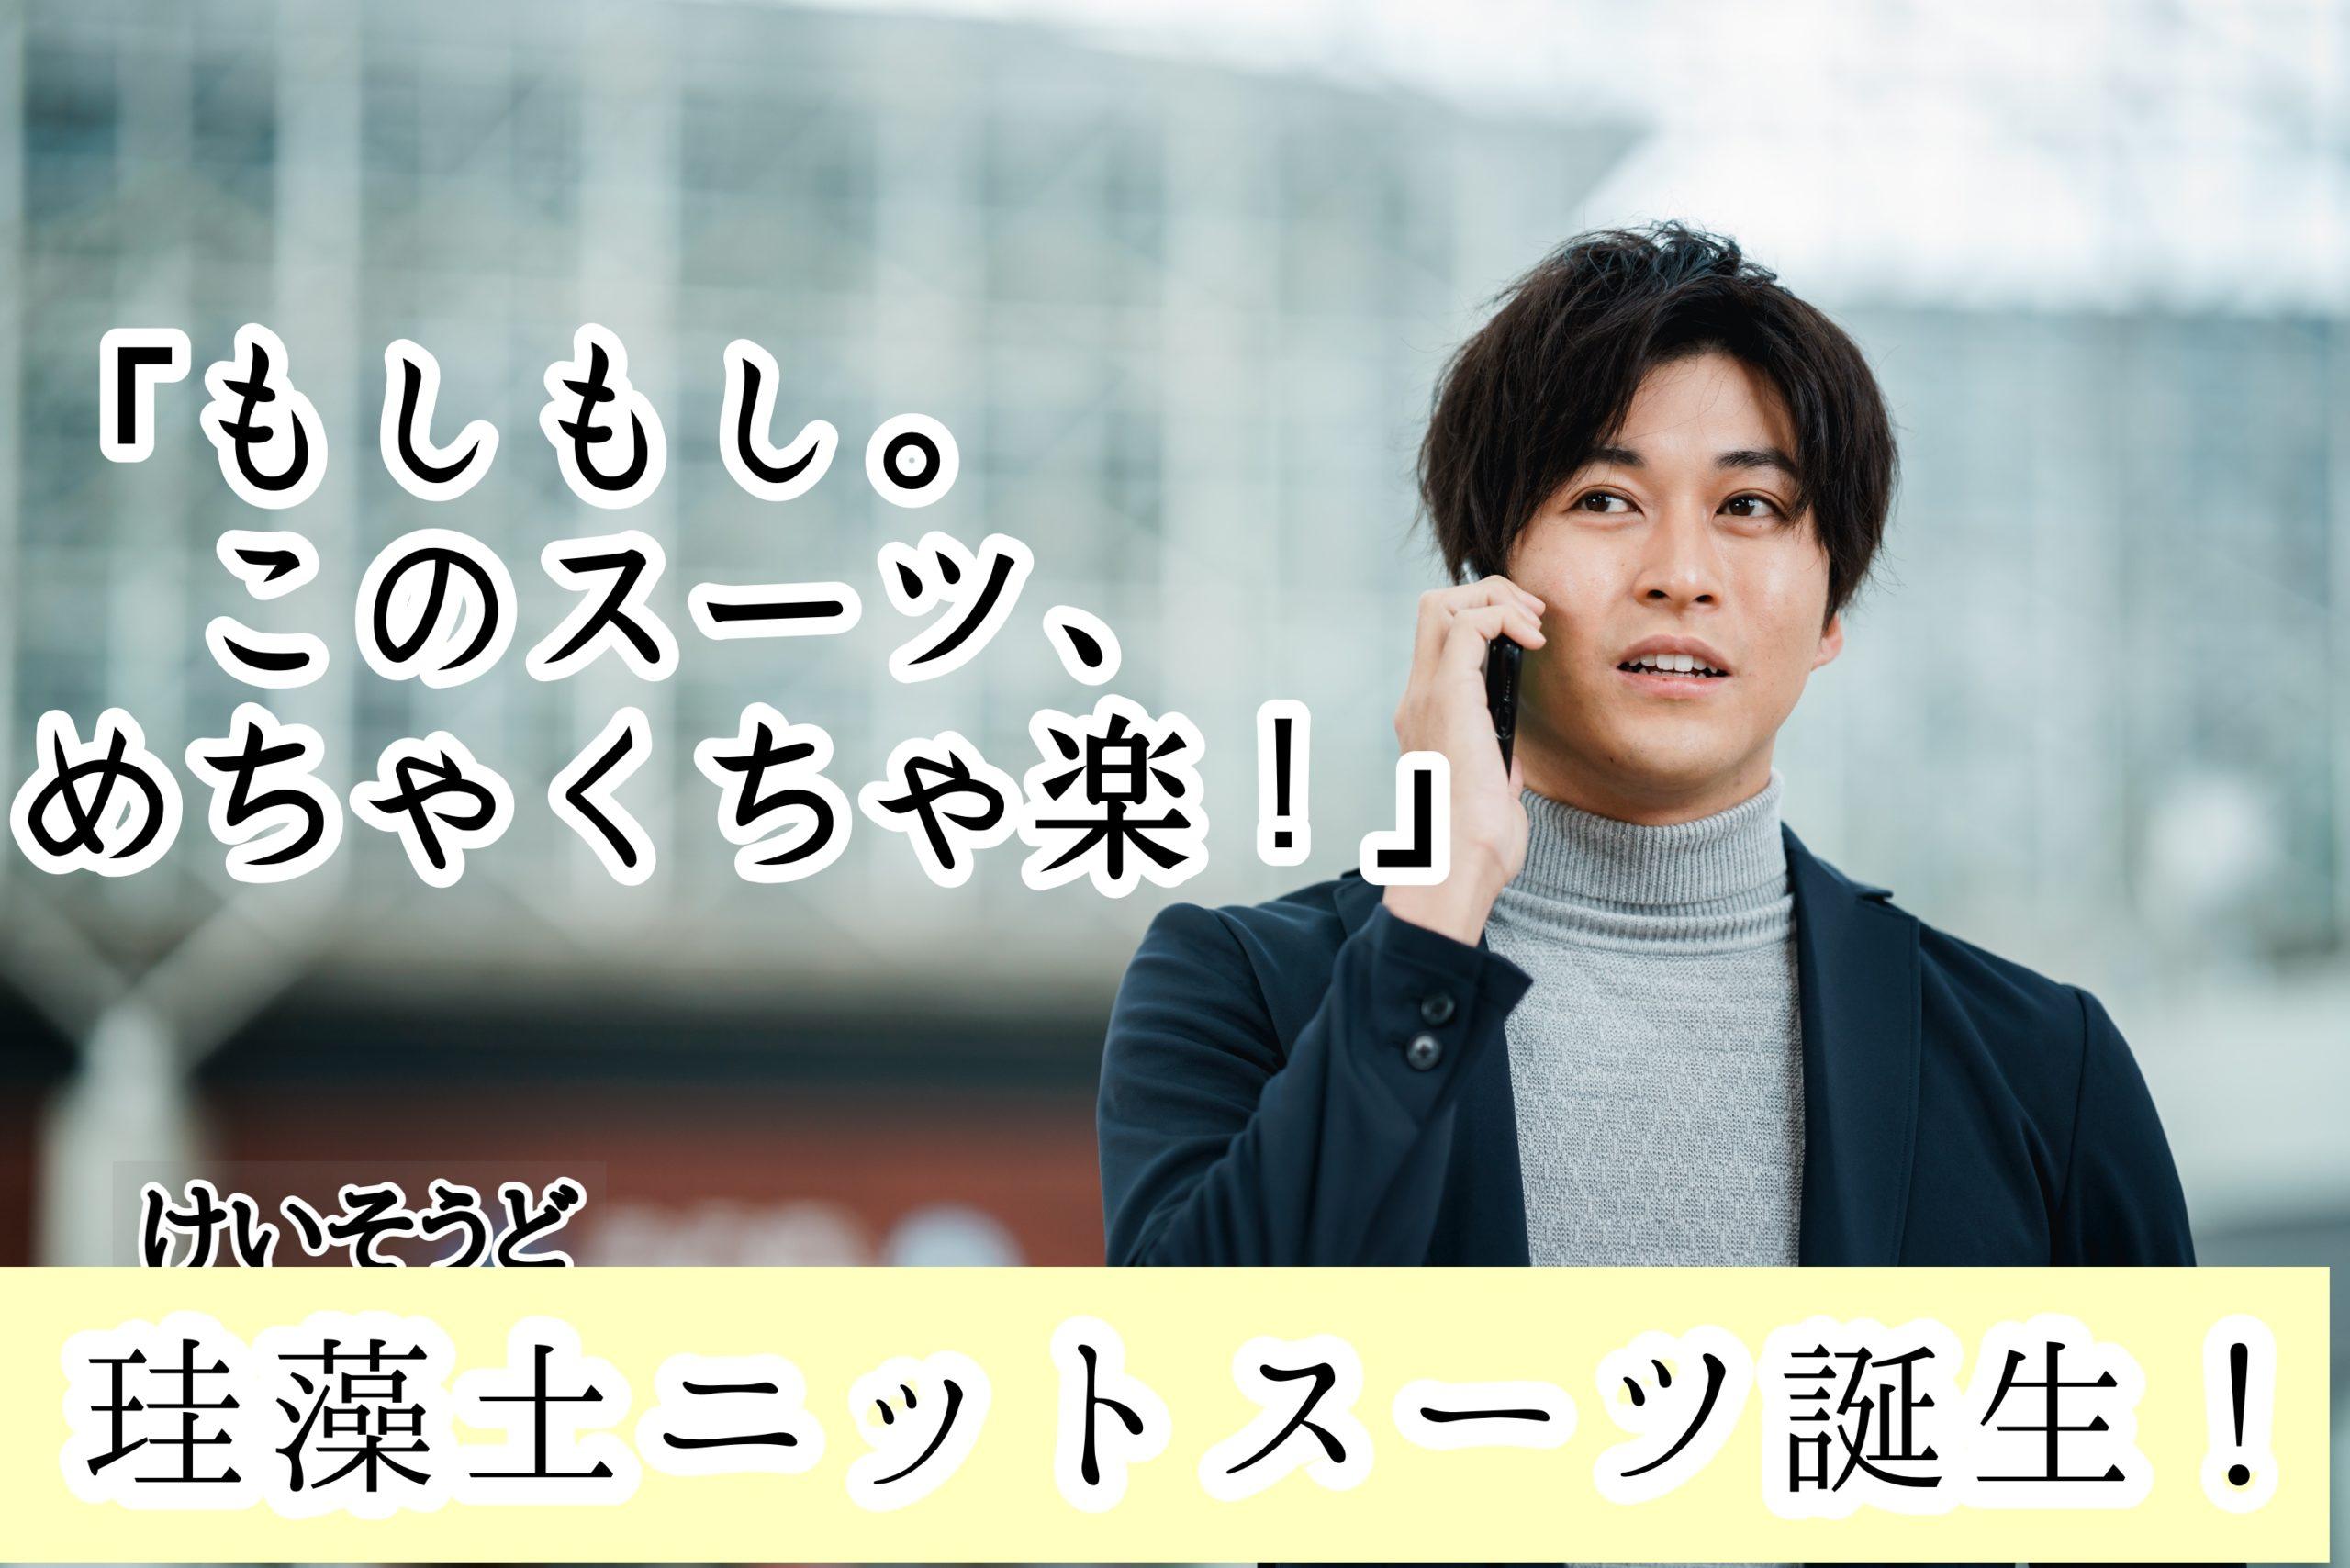 【PR】能登産の珪藻土入りストレスフリーなニットスーツを山崎至がプロデュース!